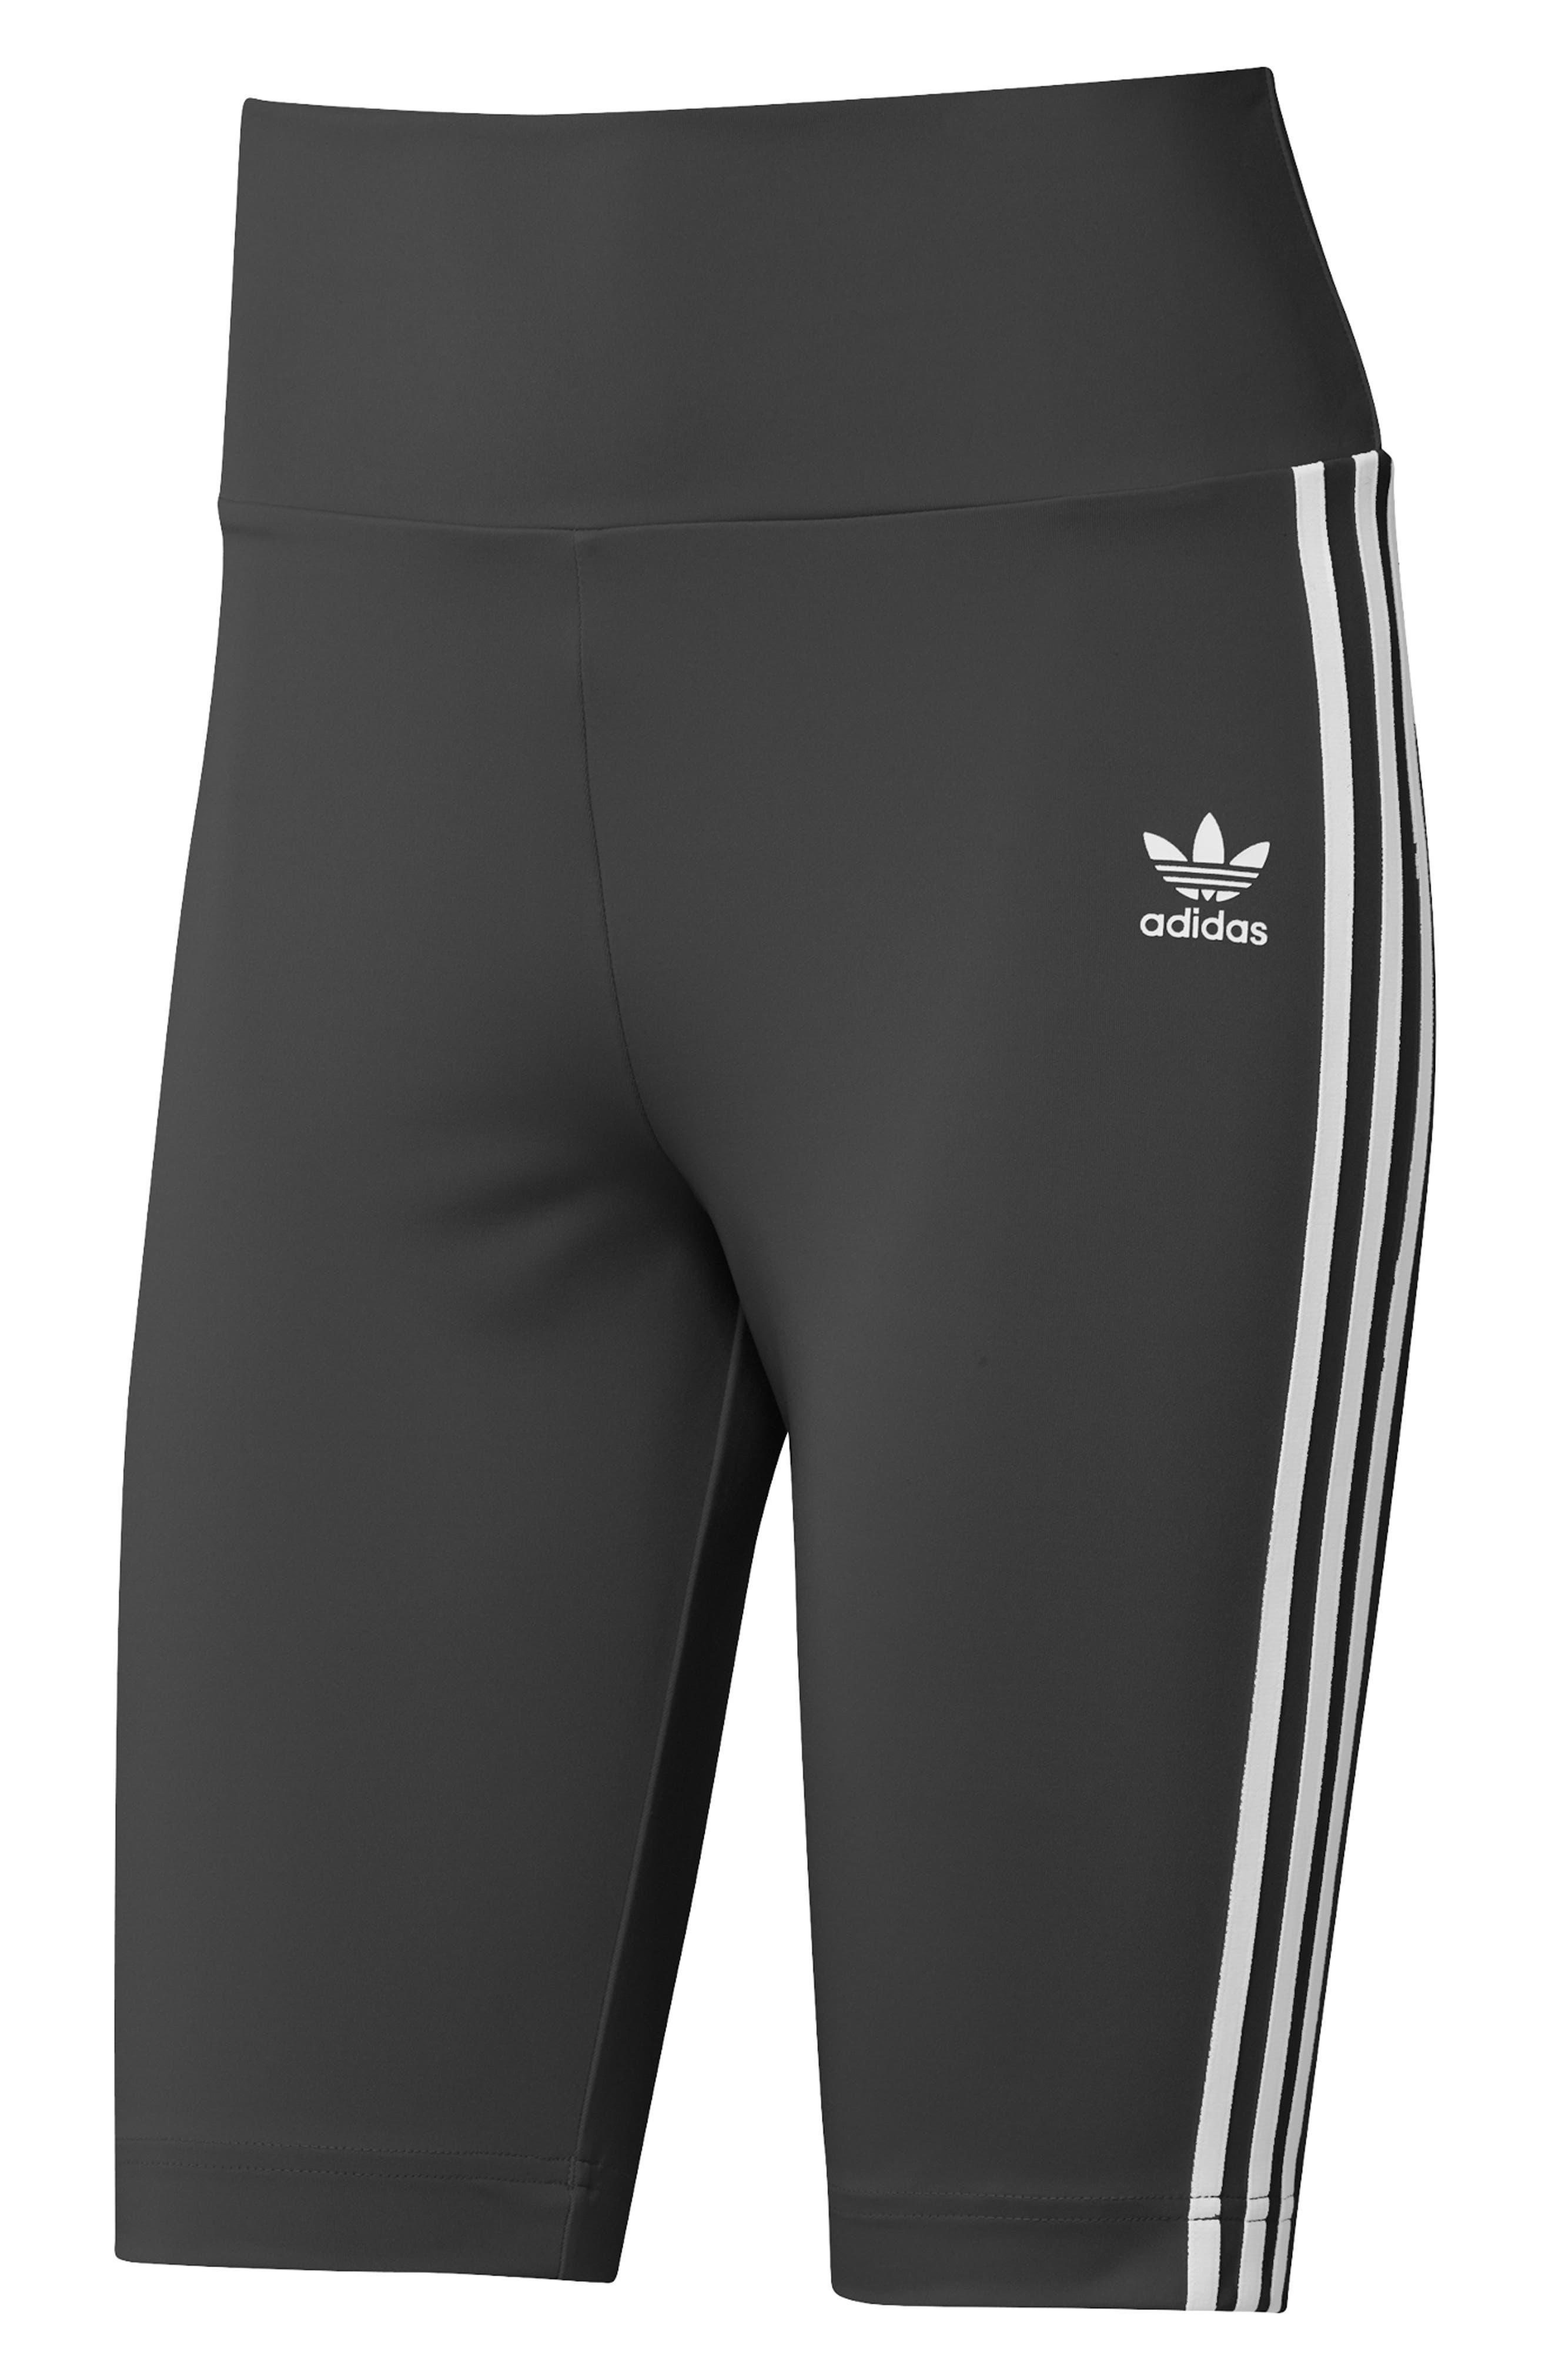 adidas Originals High Waist Bike Shorts